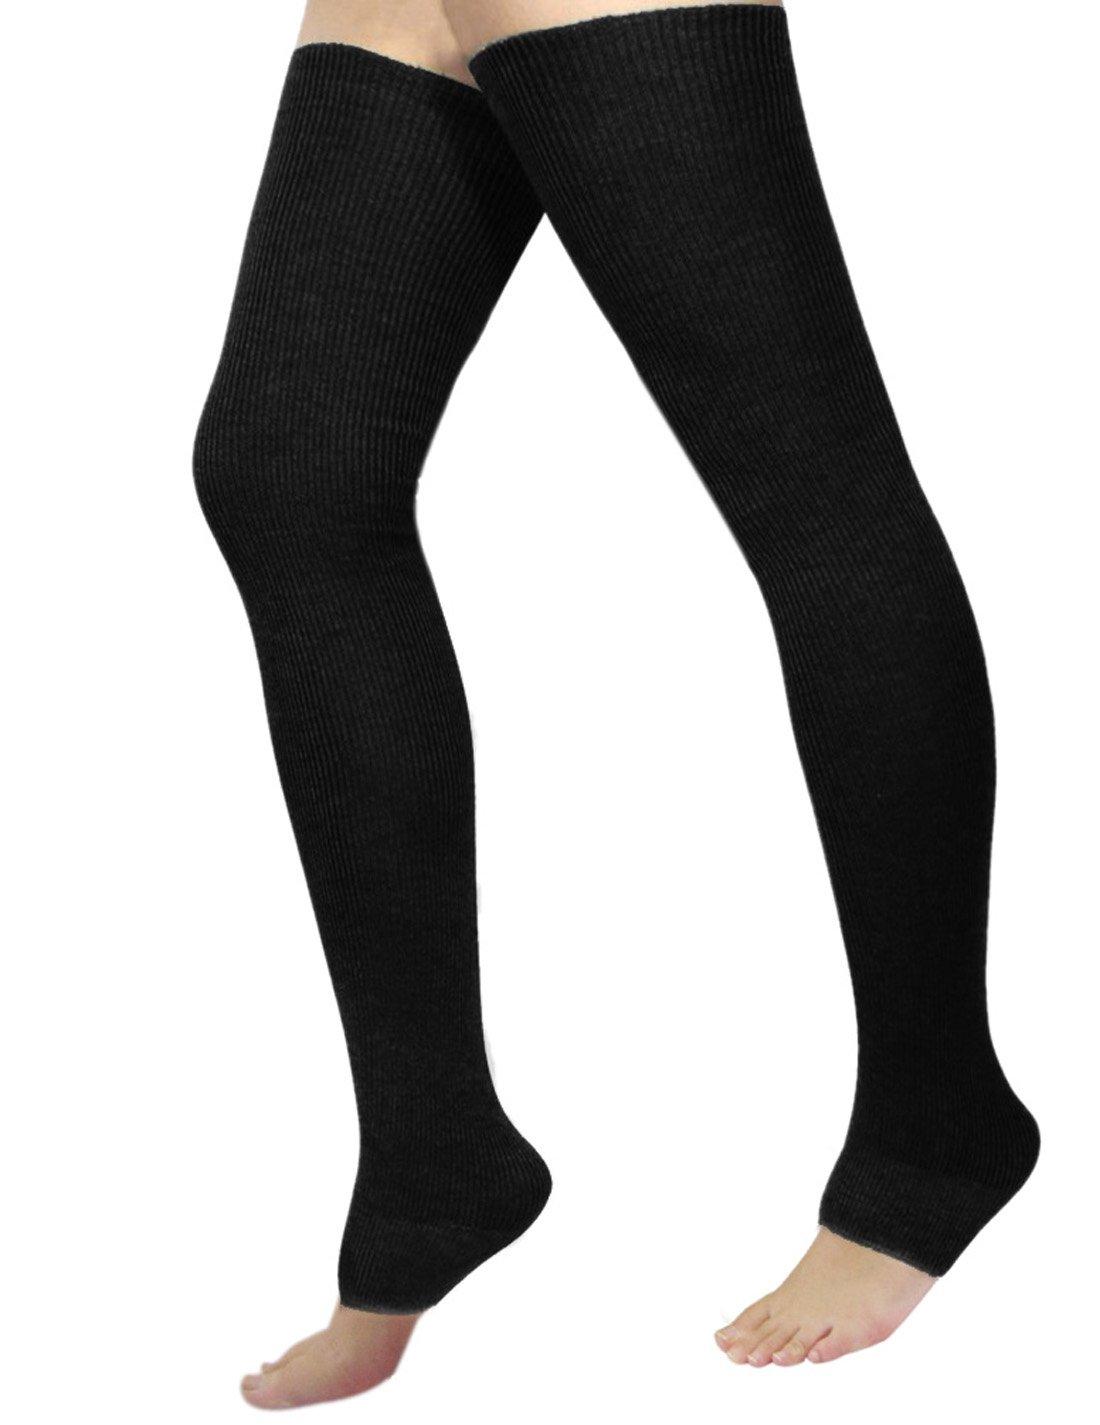 NOVAWO New Cashmere Over Knee Leg Warmers Warm Knit Boots Socks, Black, One Size by Novawo